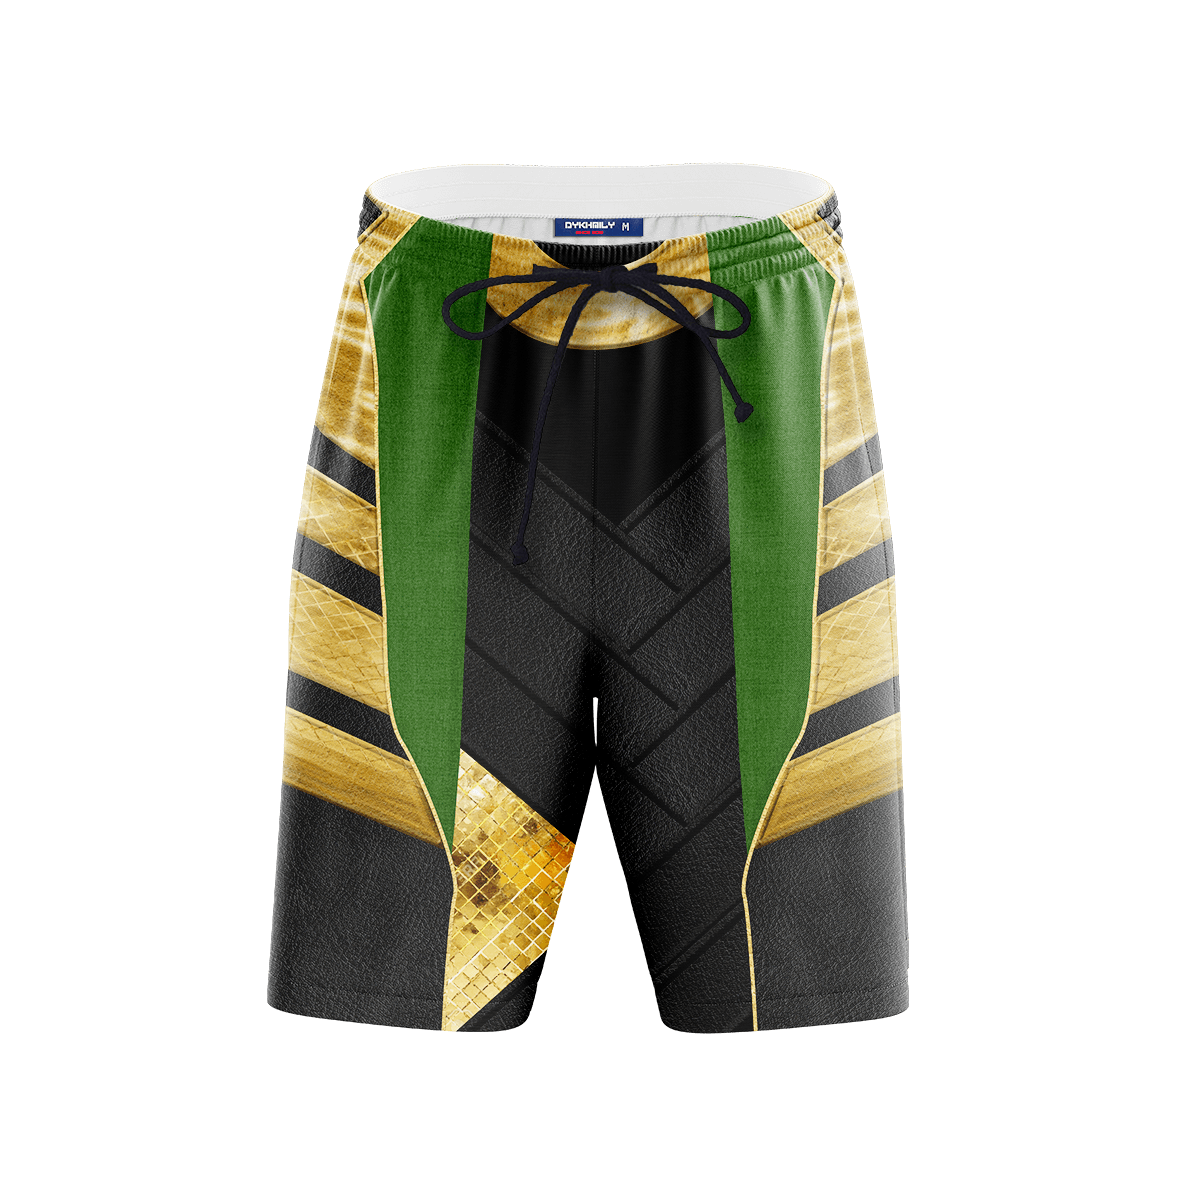 Loki Beach Shorts FDM3107 S Official Anime Swimsuit Merch